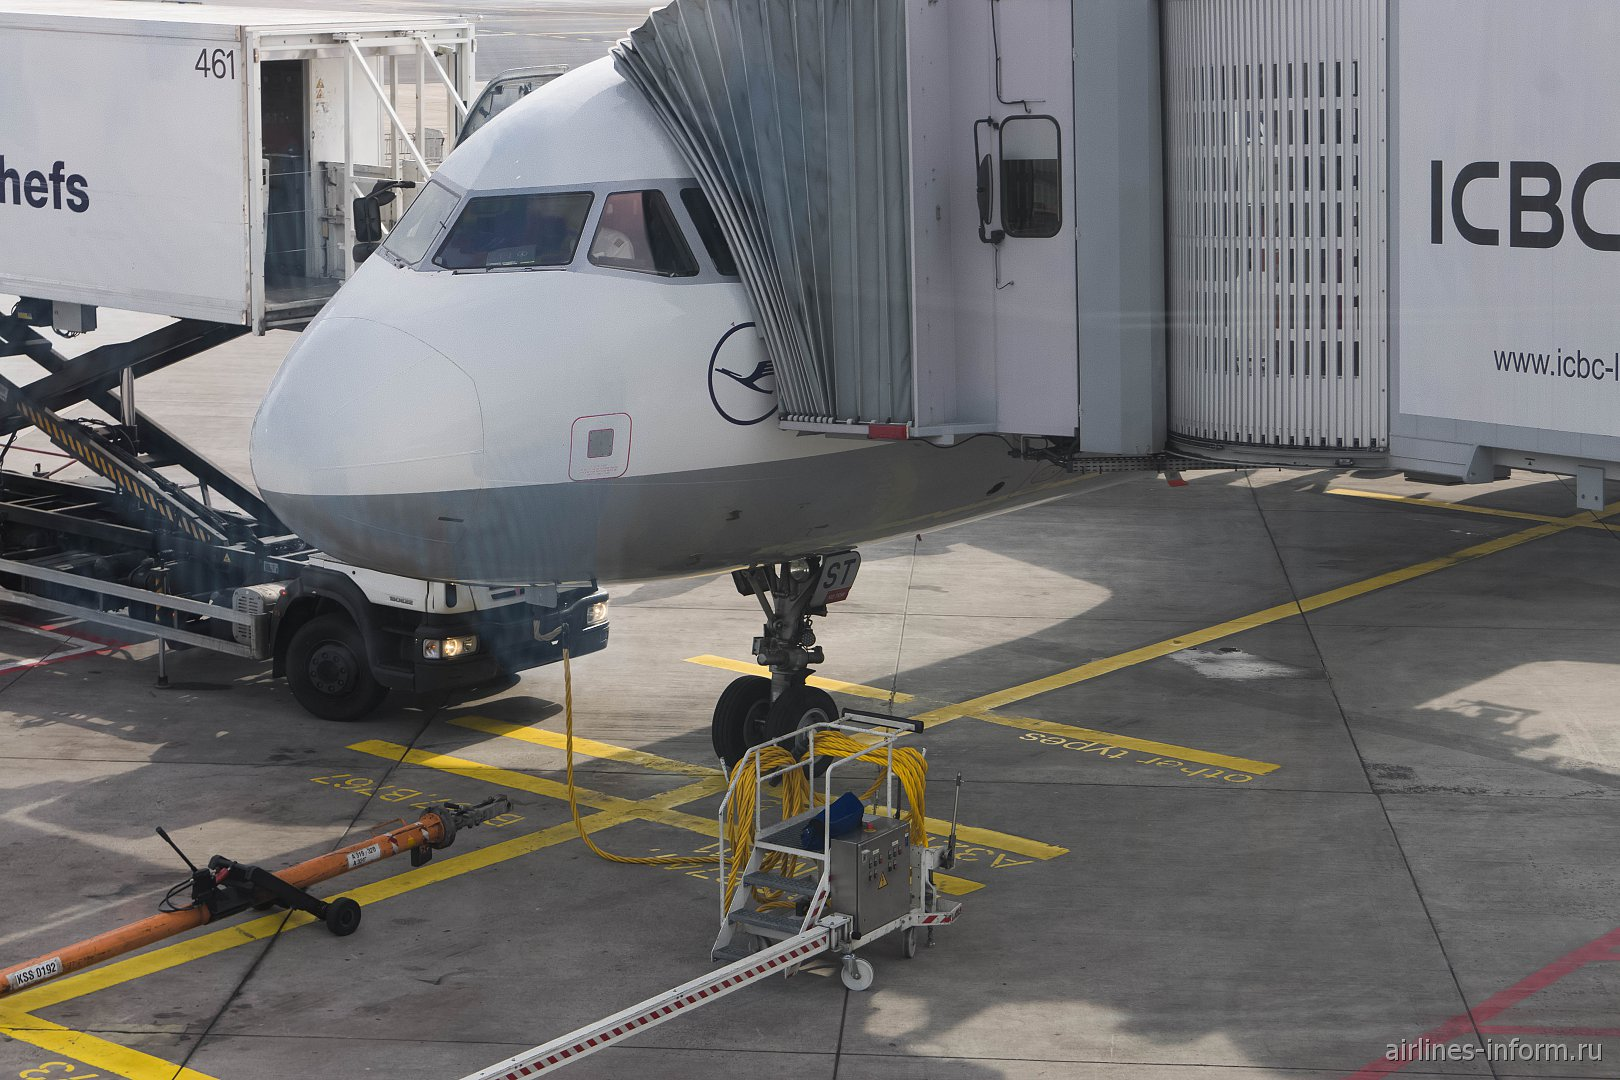 Nonstop you. Франкфурт - Москва LH1450 Lufthansa